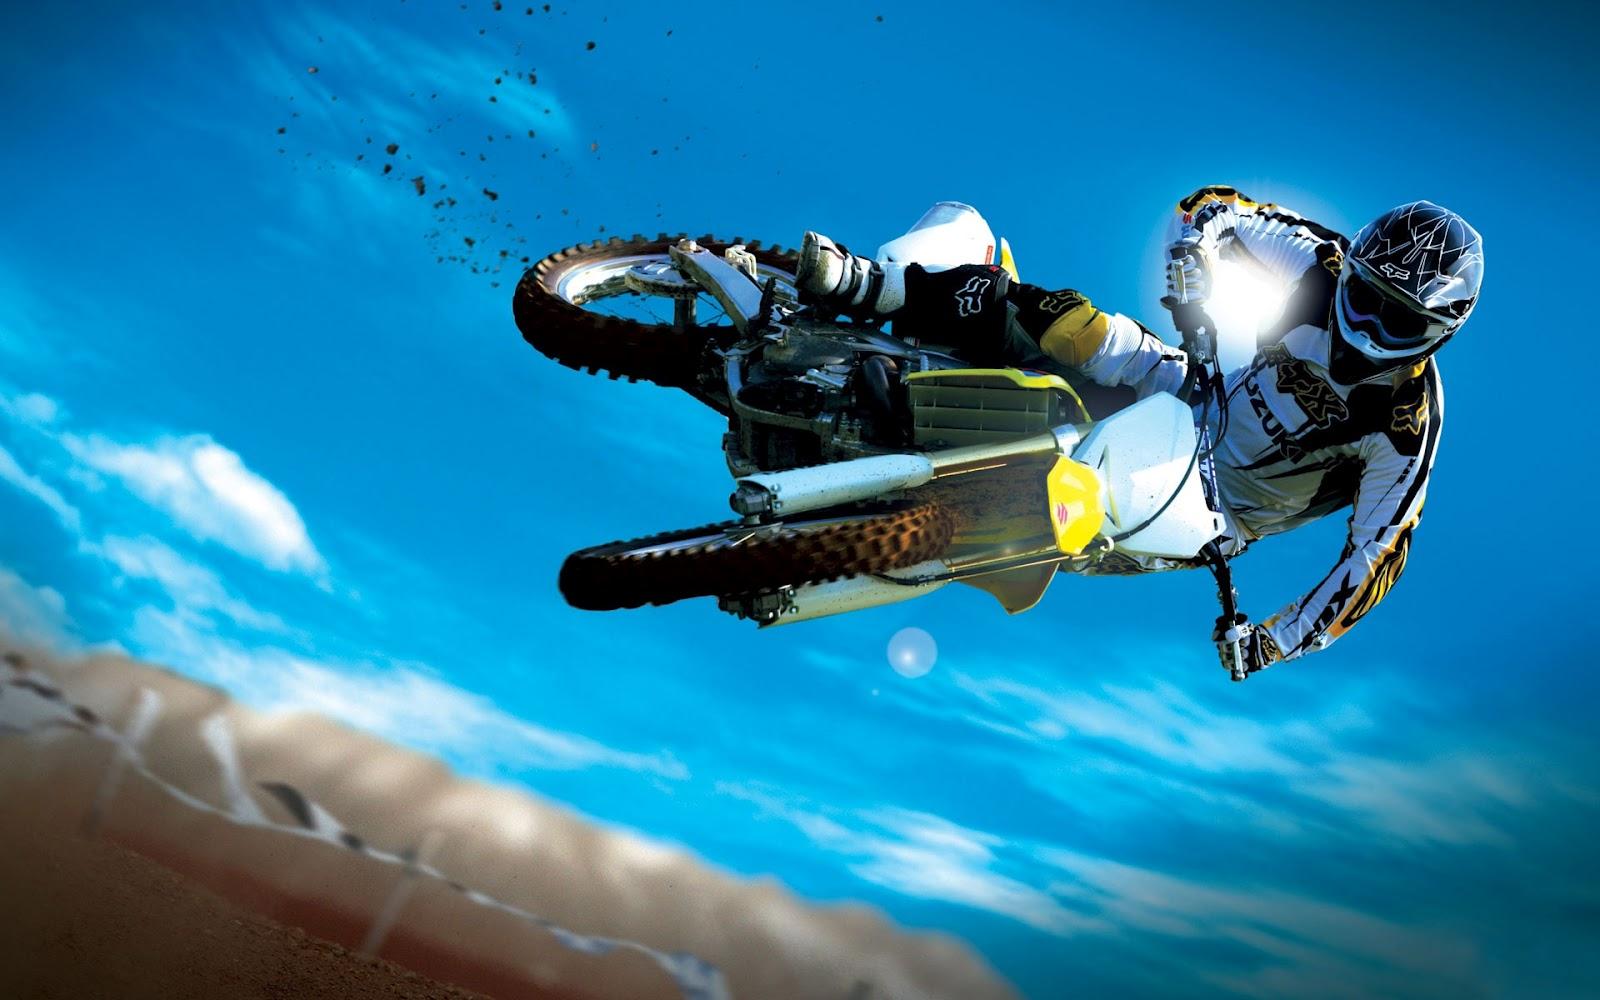 http://4.bp.blogspot.com/-POkaw9SrUVk/UFlN3YMNHVI/AAAAAAAAB6A/MxFQaWiUf7o/s1600/amazing_motocross_bike_stunt-1920x1200.jpg